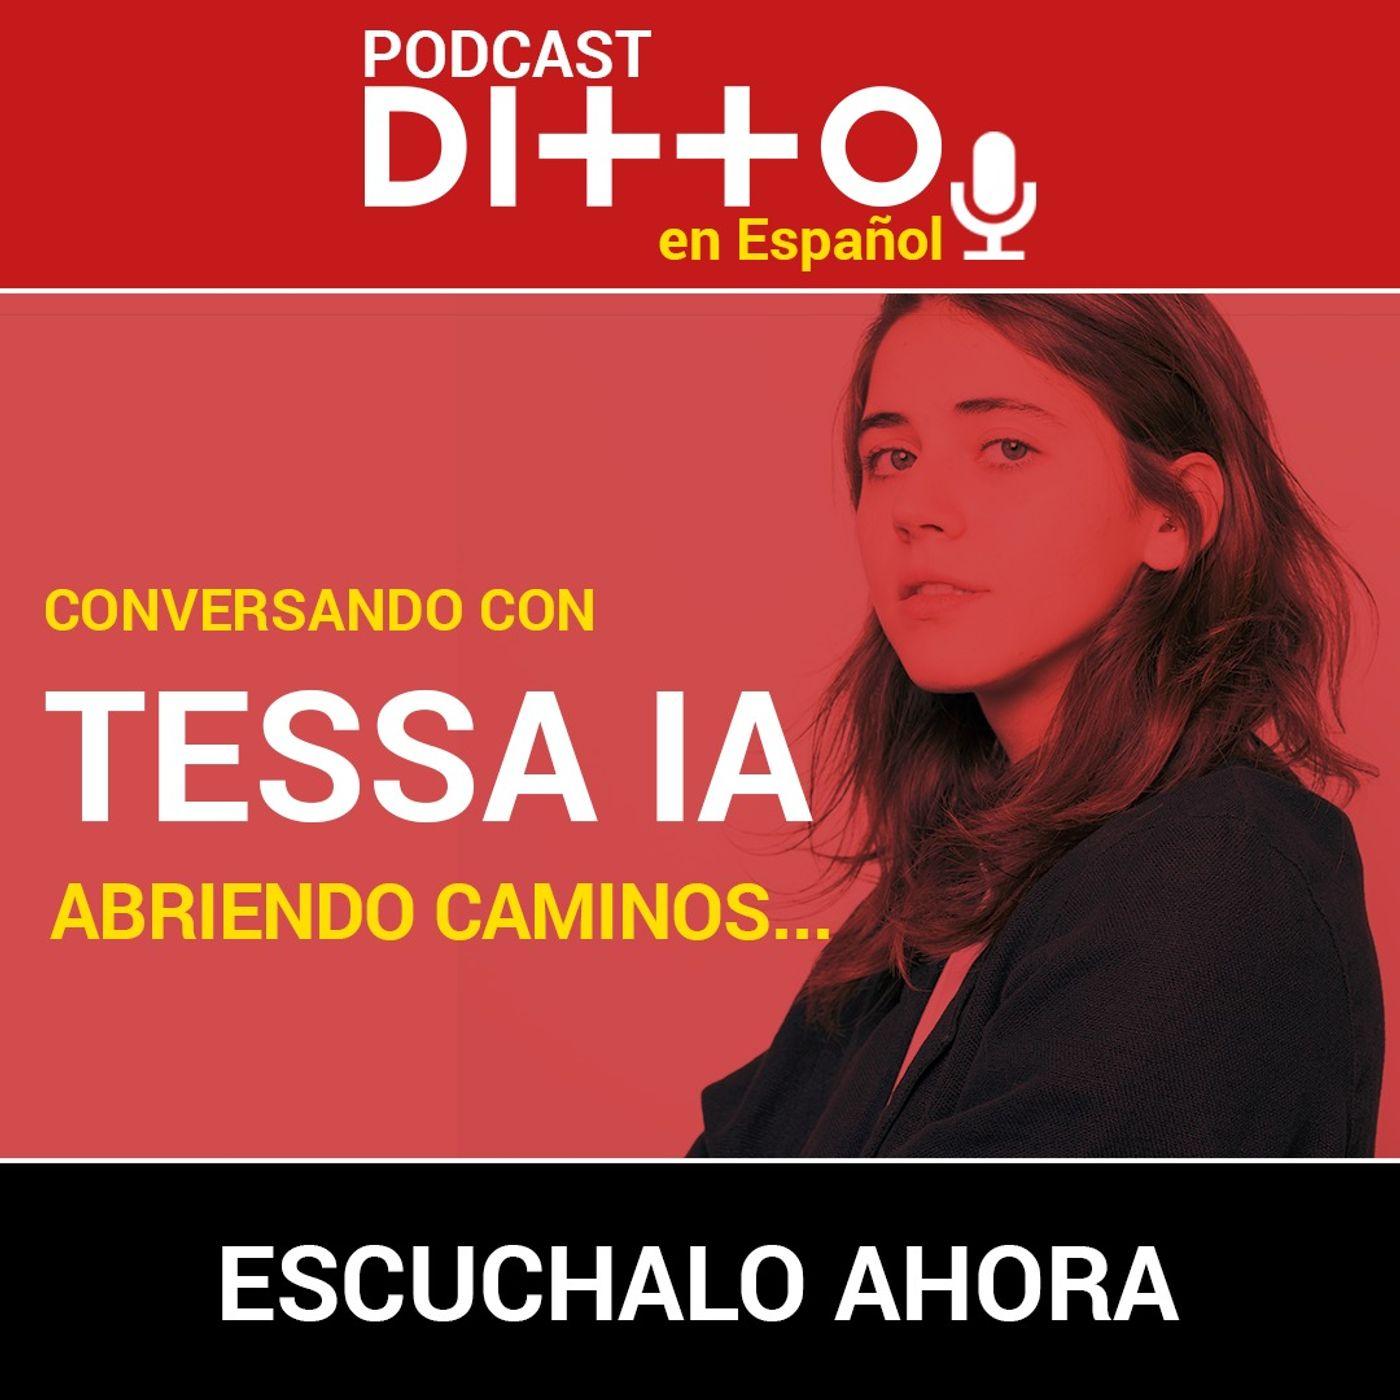 Conversando con Tessa IA: Abriendo caminos...